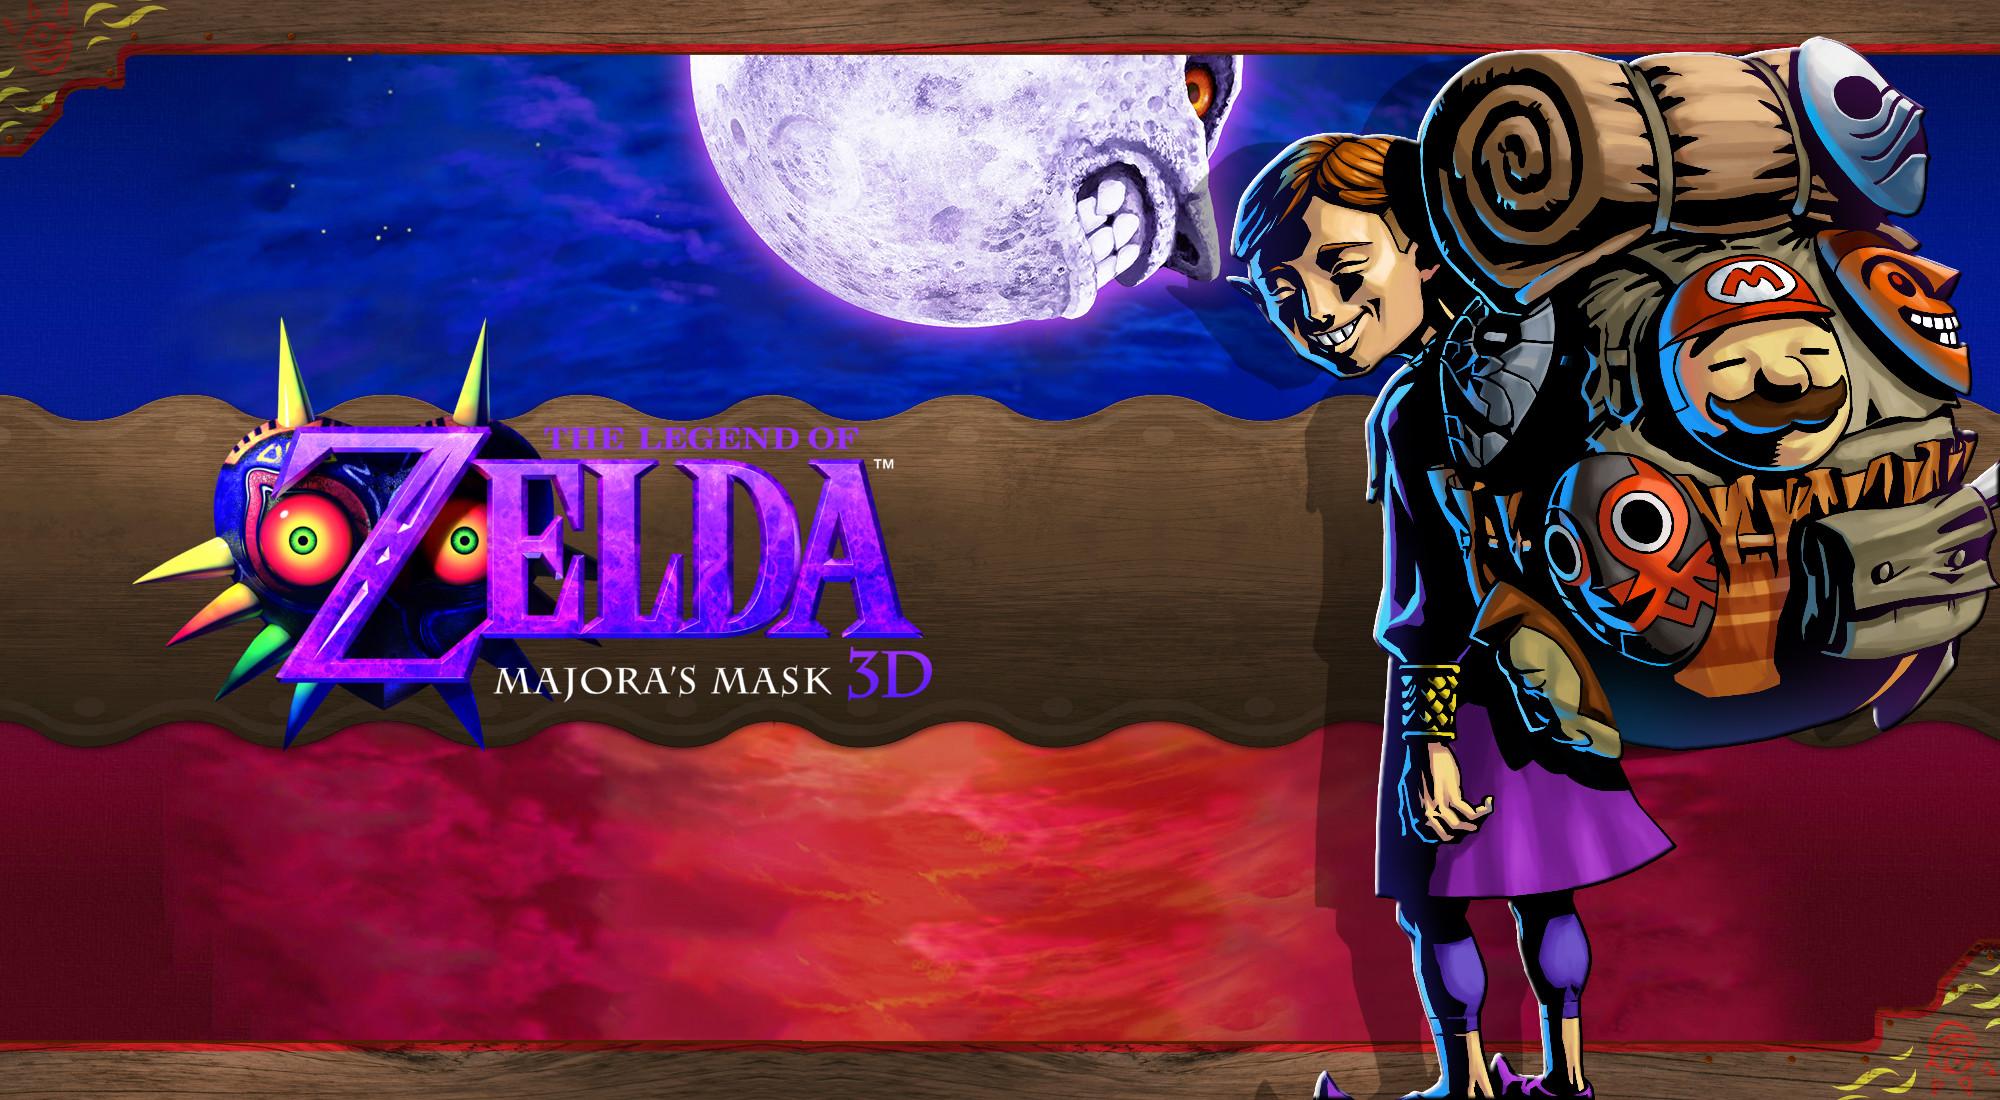 … Majora's Mask 3D Wallpaper – Happy Mask Salesman 2 by DaKidGaming